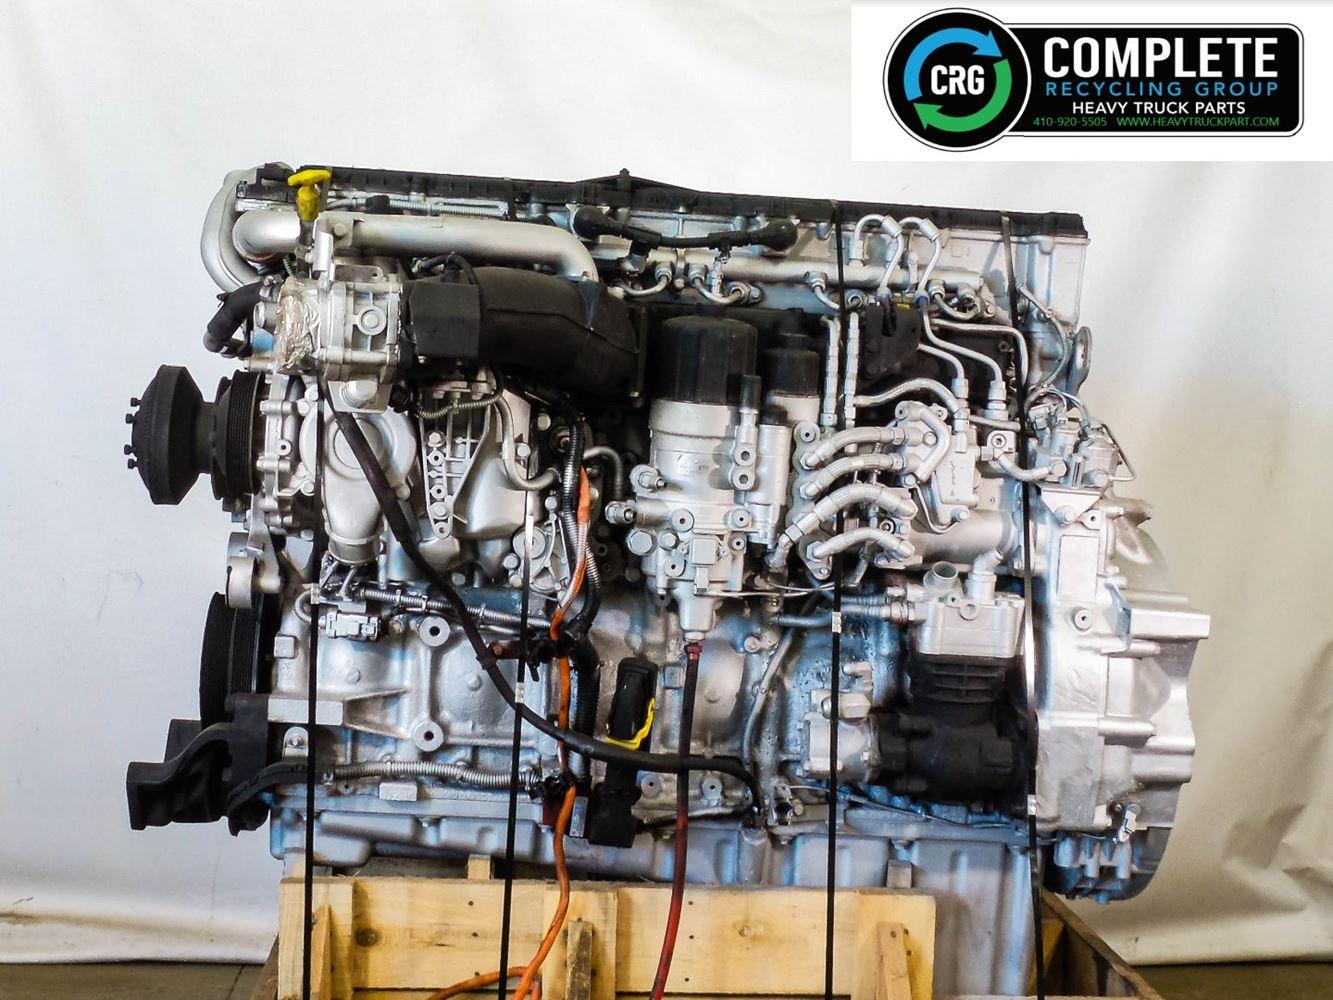 2013 DETROIT DD13 ENGINE ASSEMBLY TRUCK PARTS #679775